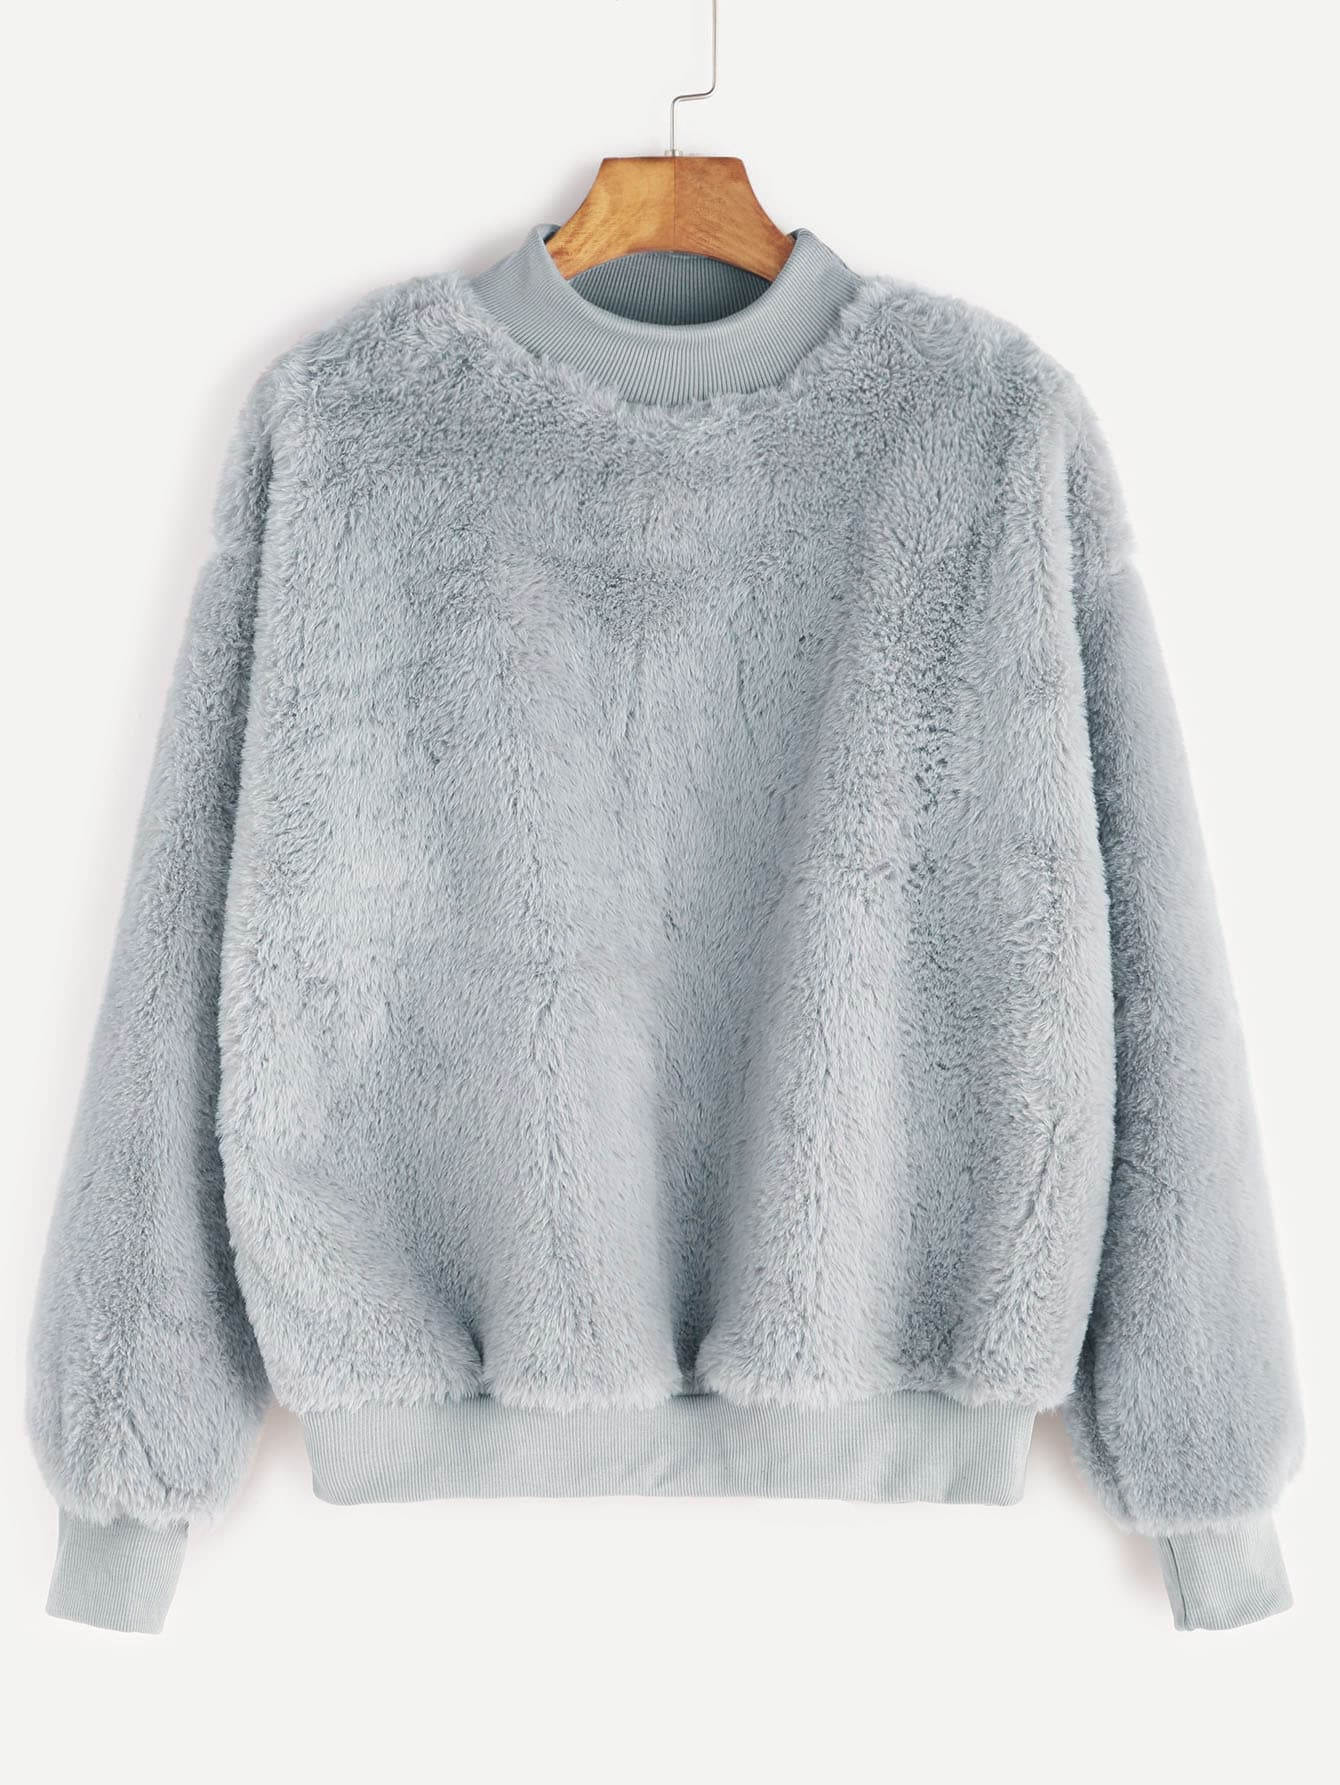 Contrast Ribbed Trim Drop Shoulder Fluffy Sweatshirt sweatshirt161121108